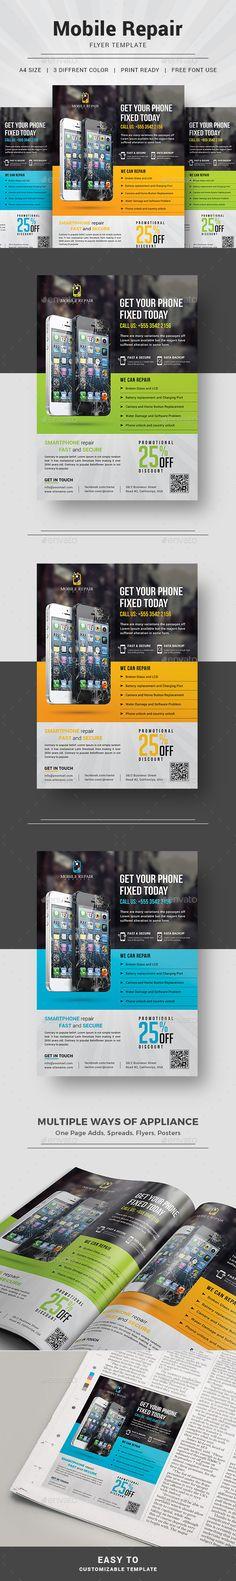 Smartphone Repair Service Flyer   Download https://graphicriver.net/item/smartphone-repair-service-flyer/16193351?ref=themedevisers